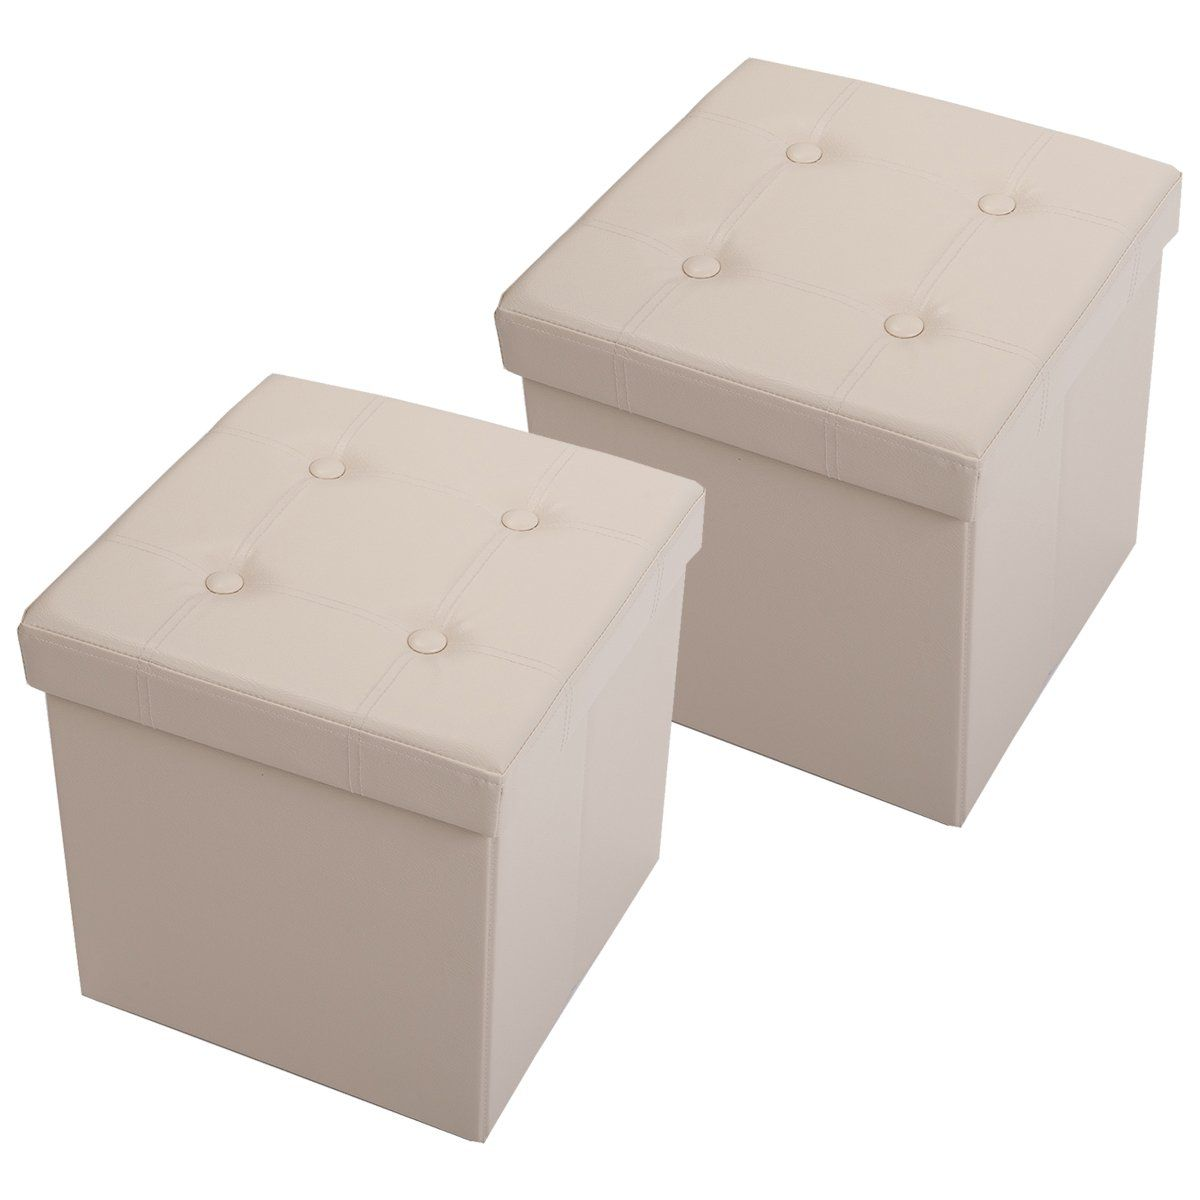 Kokomix Folding Storage Ottoman Cube Foot Rest Stool Seat Faux Leather Beige Set Of 2 You Can Storage Cube Ottoman Storage Ottoman Folding Storage Ottoman